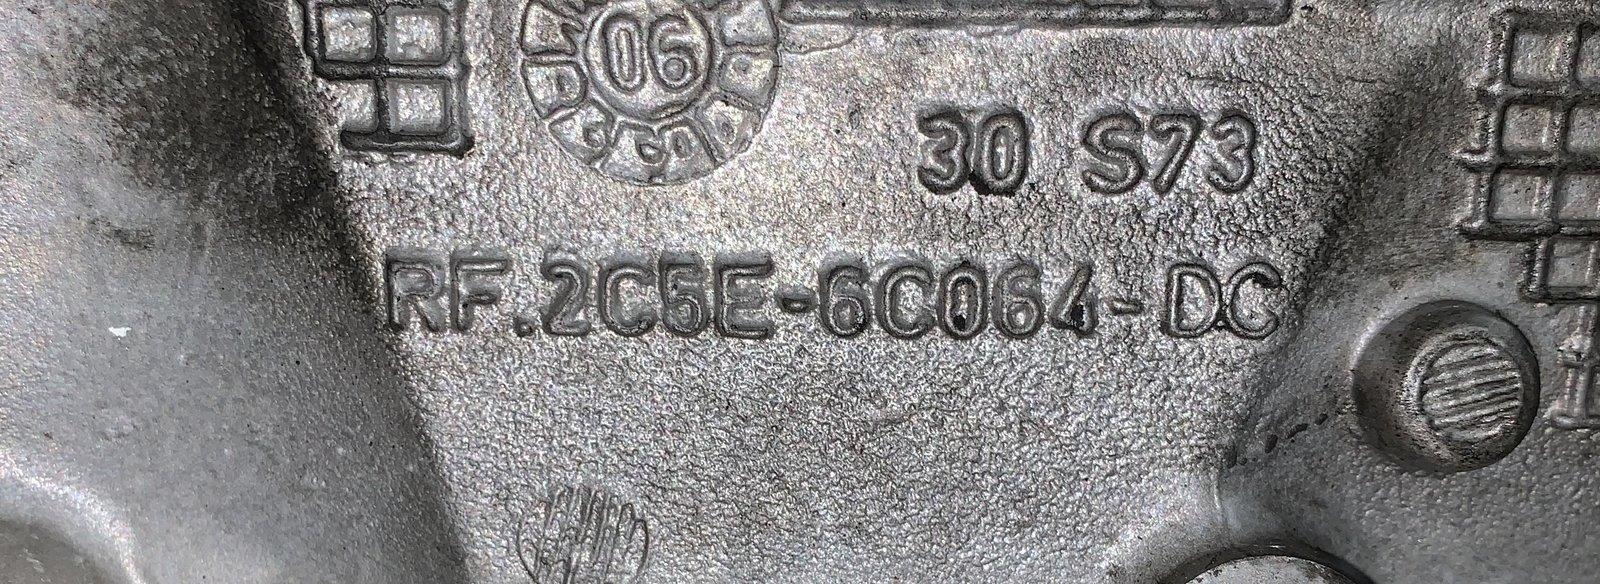 E40CBA2C-DB4D-456E-A9F9-FD60B3716FD0.jpeg